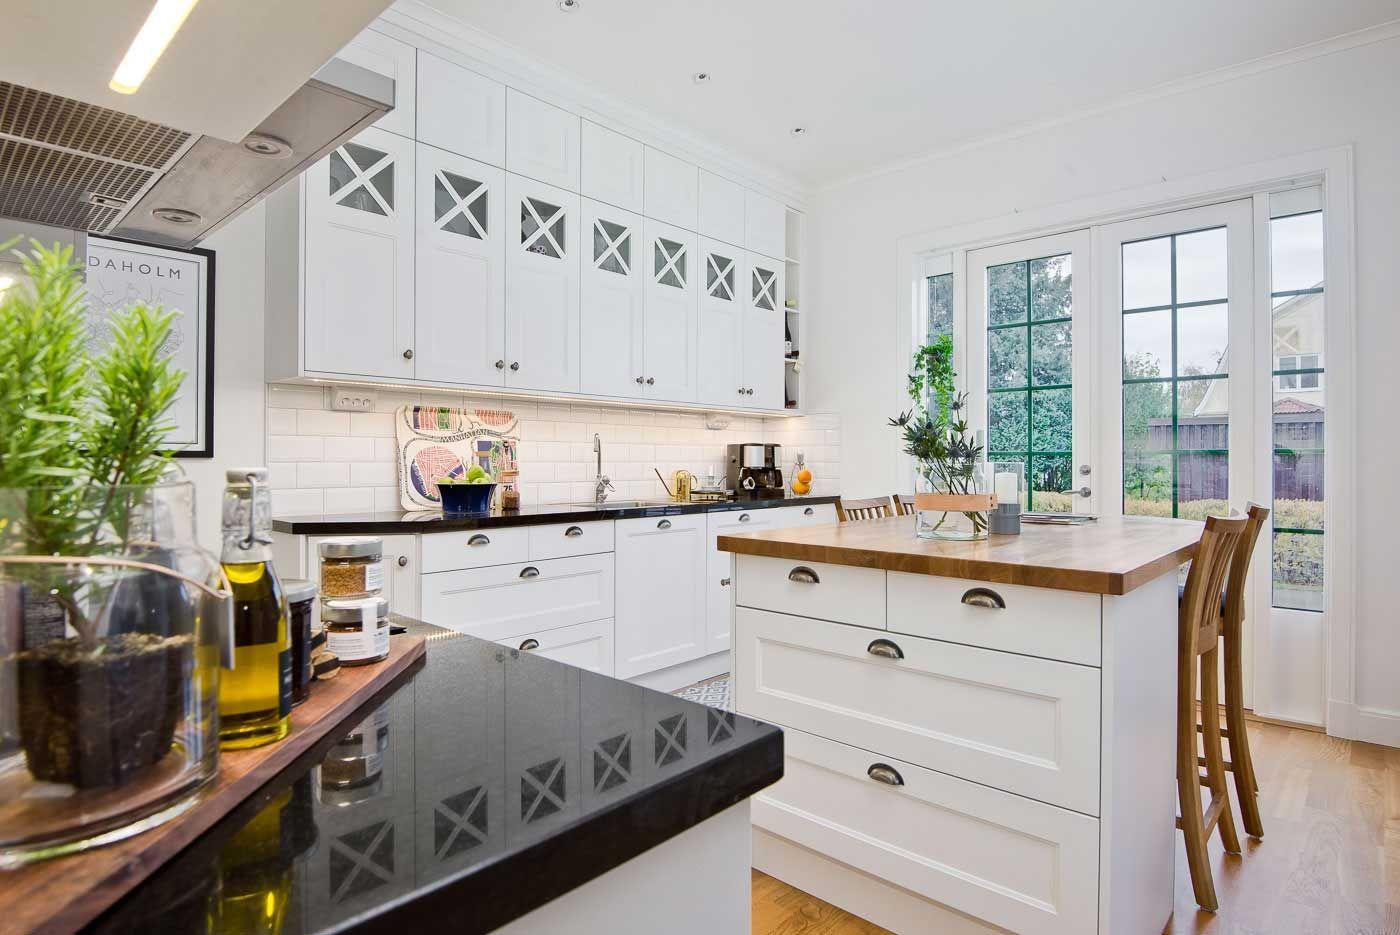 Skandináv konyha - gyönyörű vintage konyha képek   Cliff konyhabútor ...